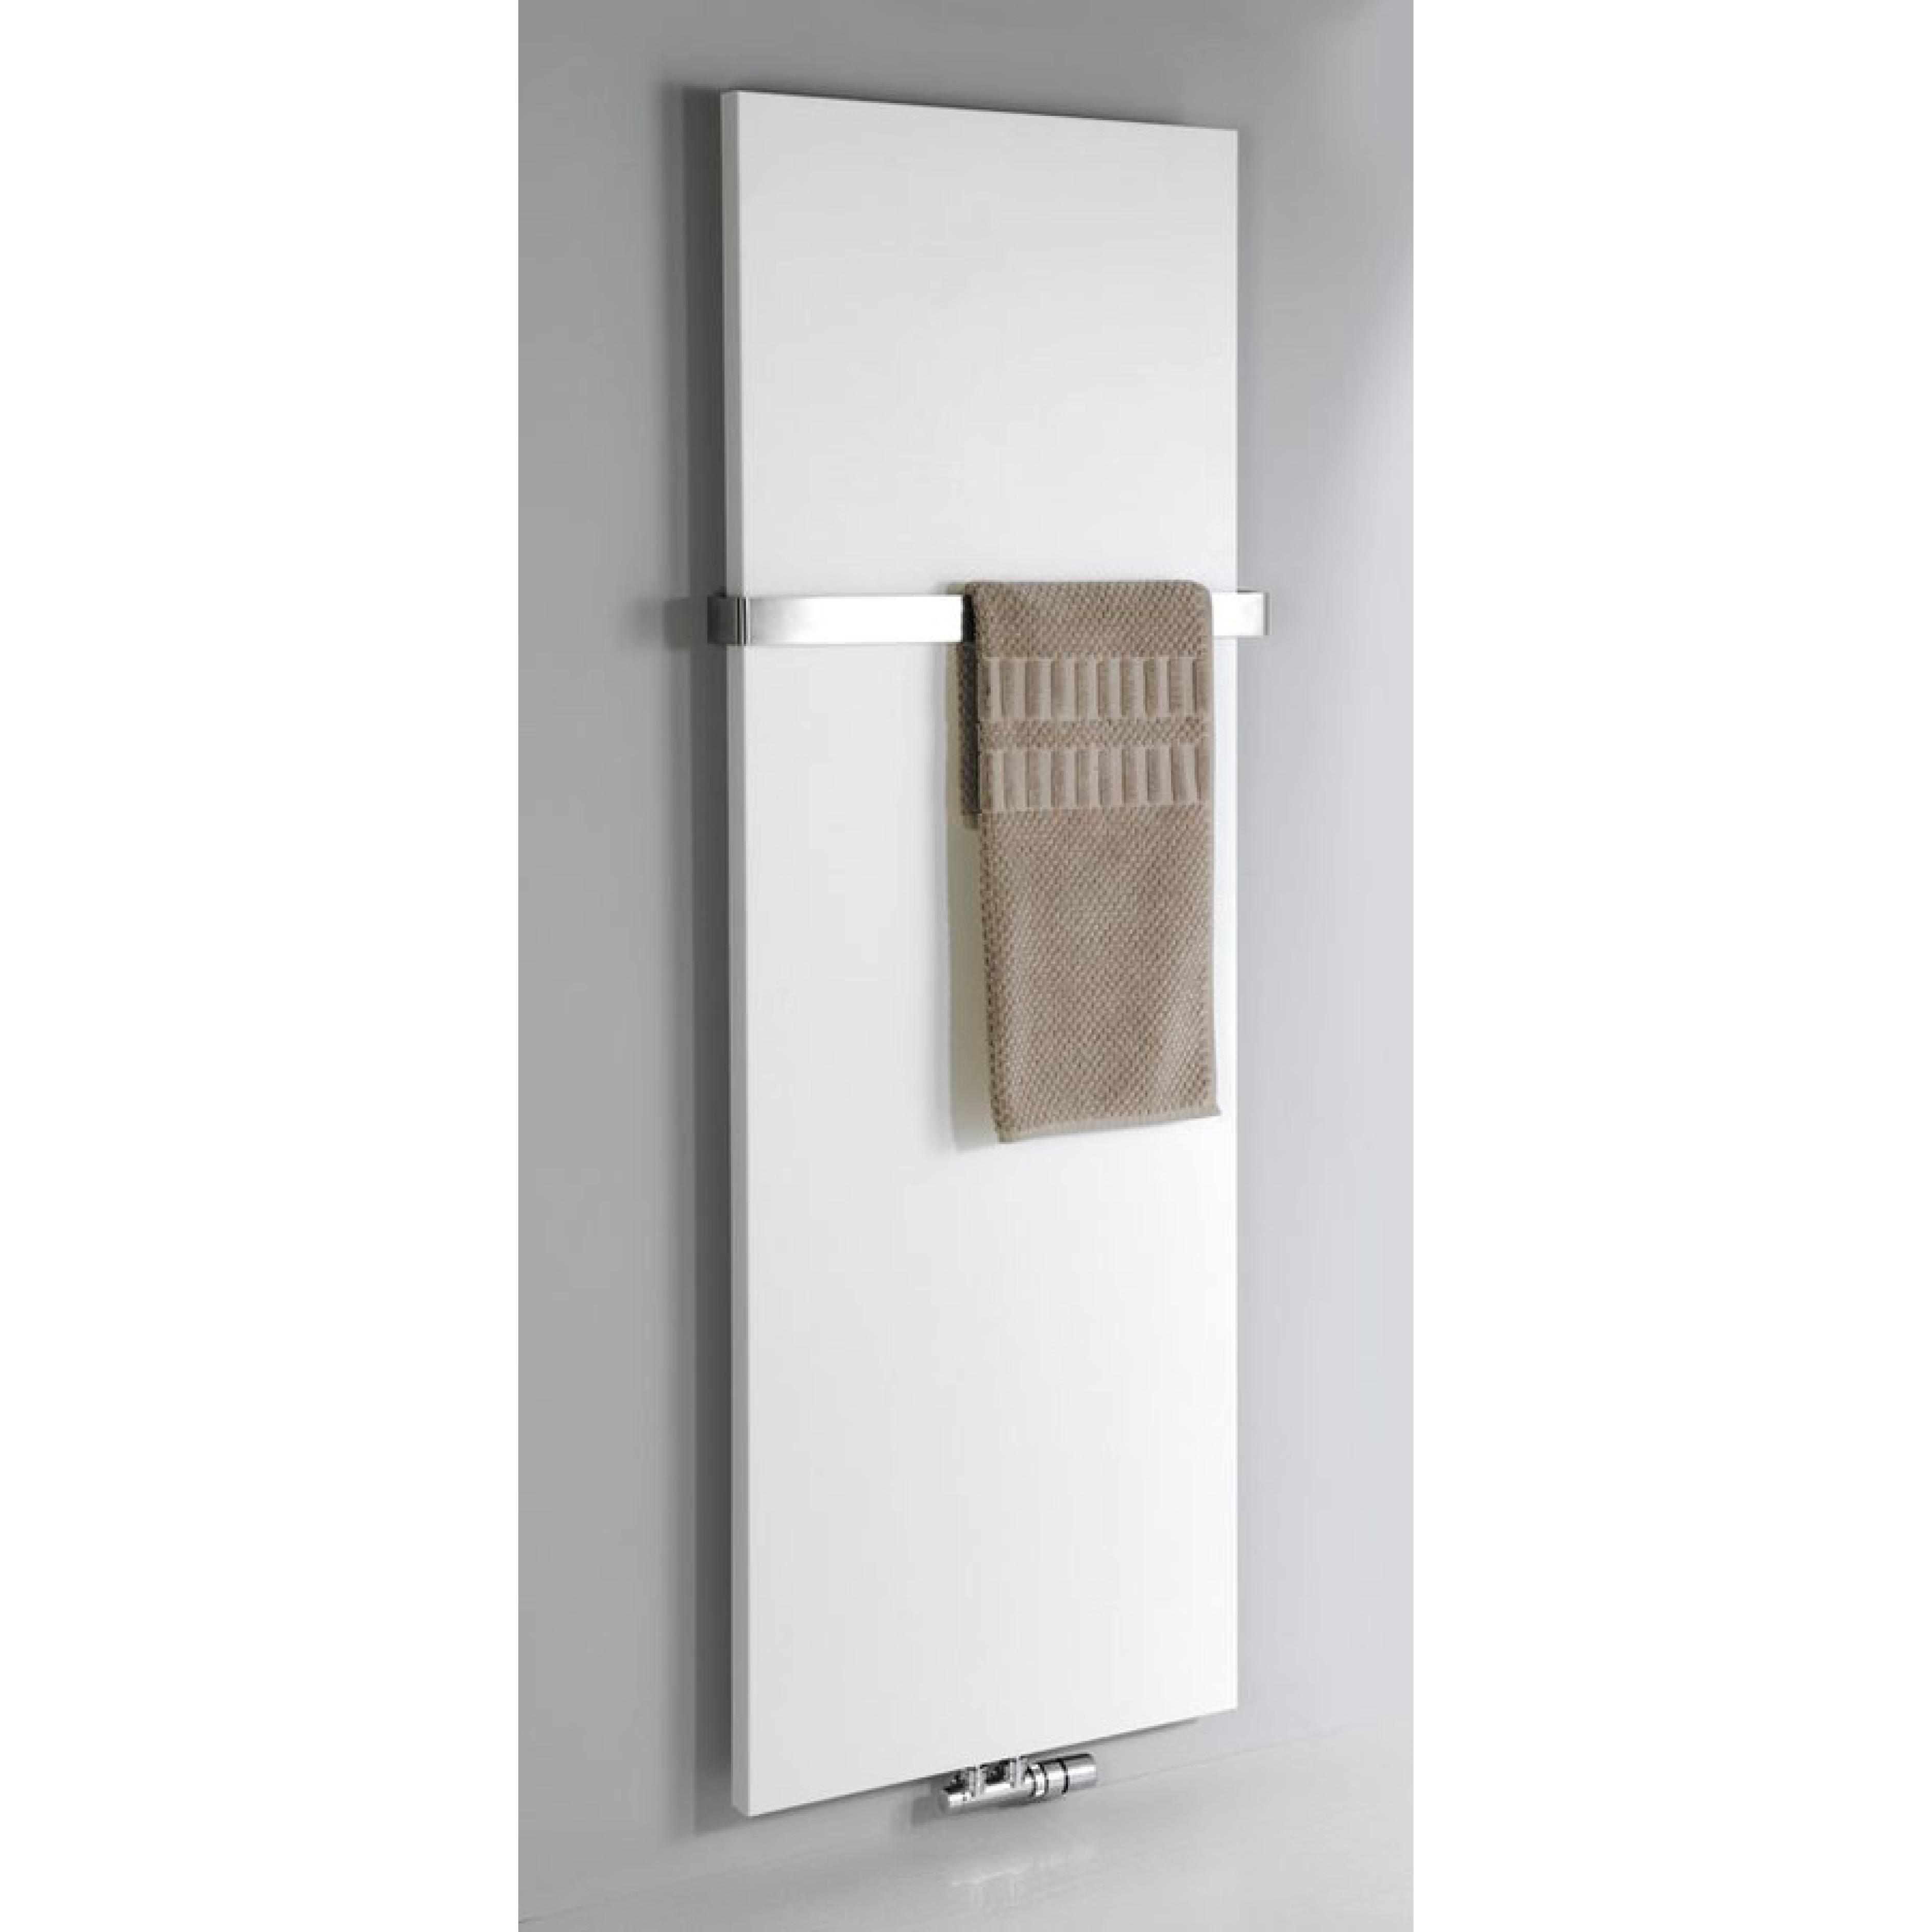 radiateur eau chaude magnifica aquabains. Black Bedroom Furniture Sets. Home Design Ideas